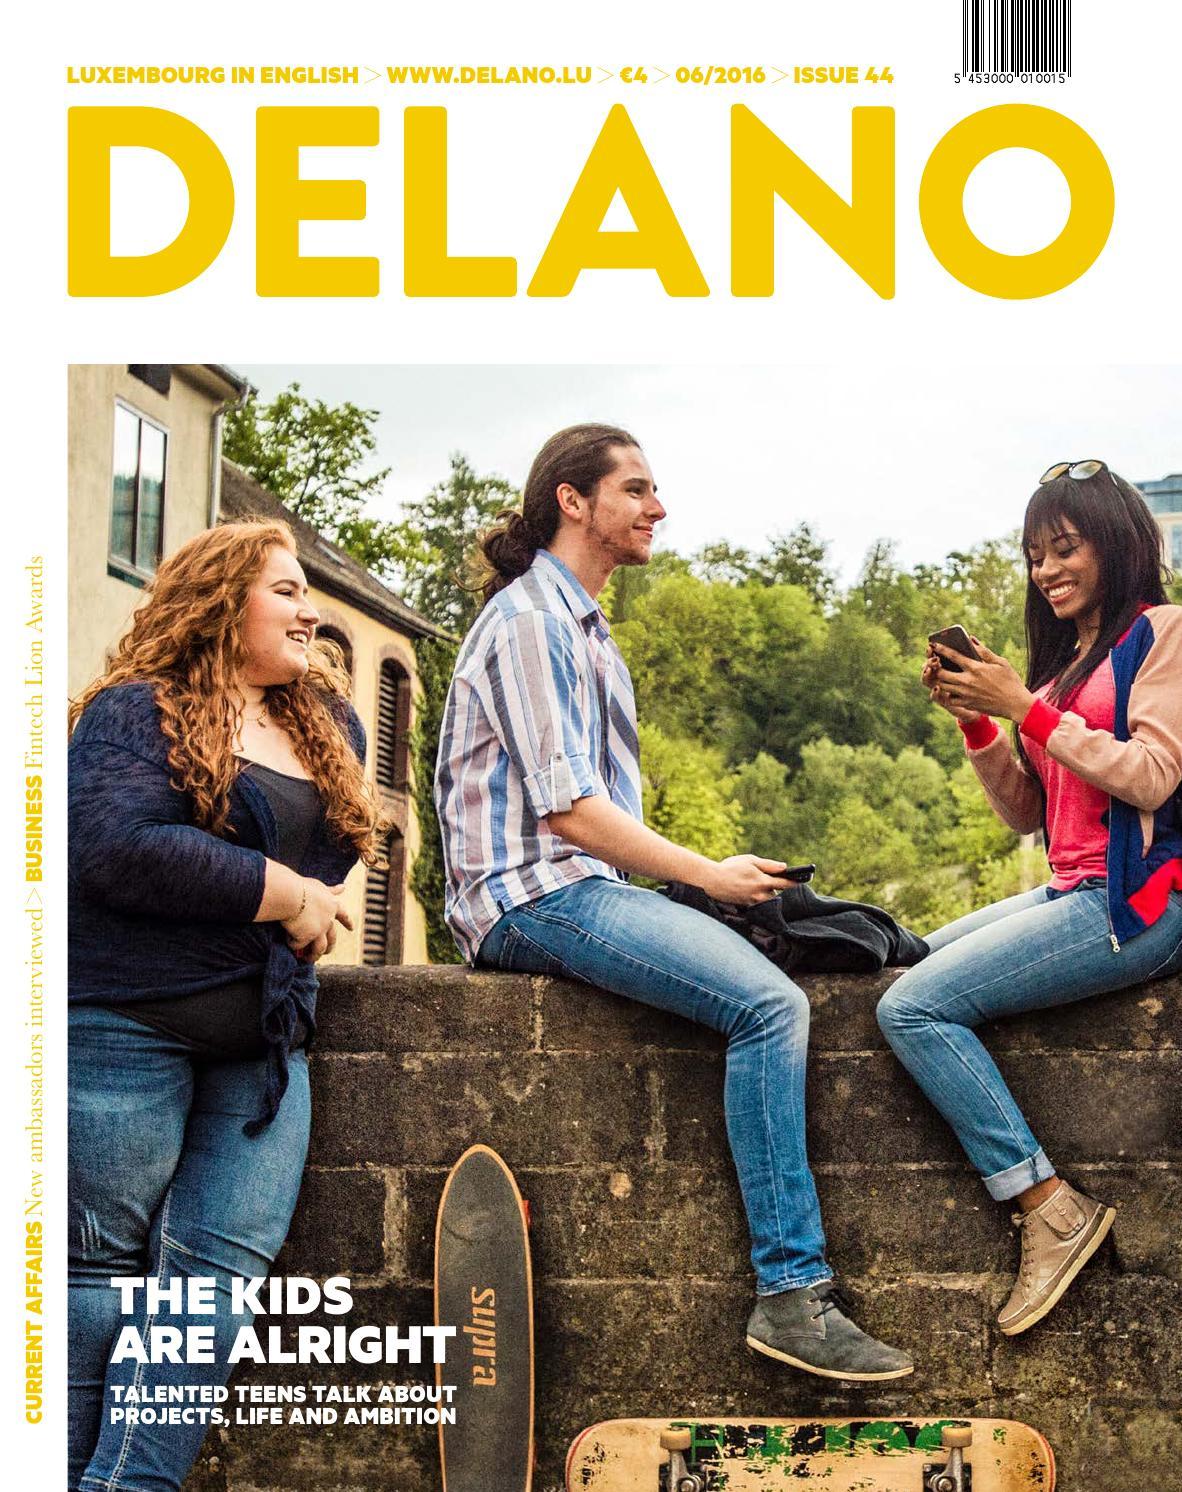 Delano summer 2015 by maison moderne   issuu